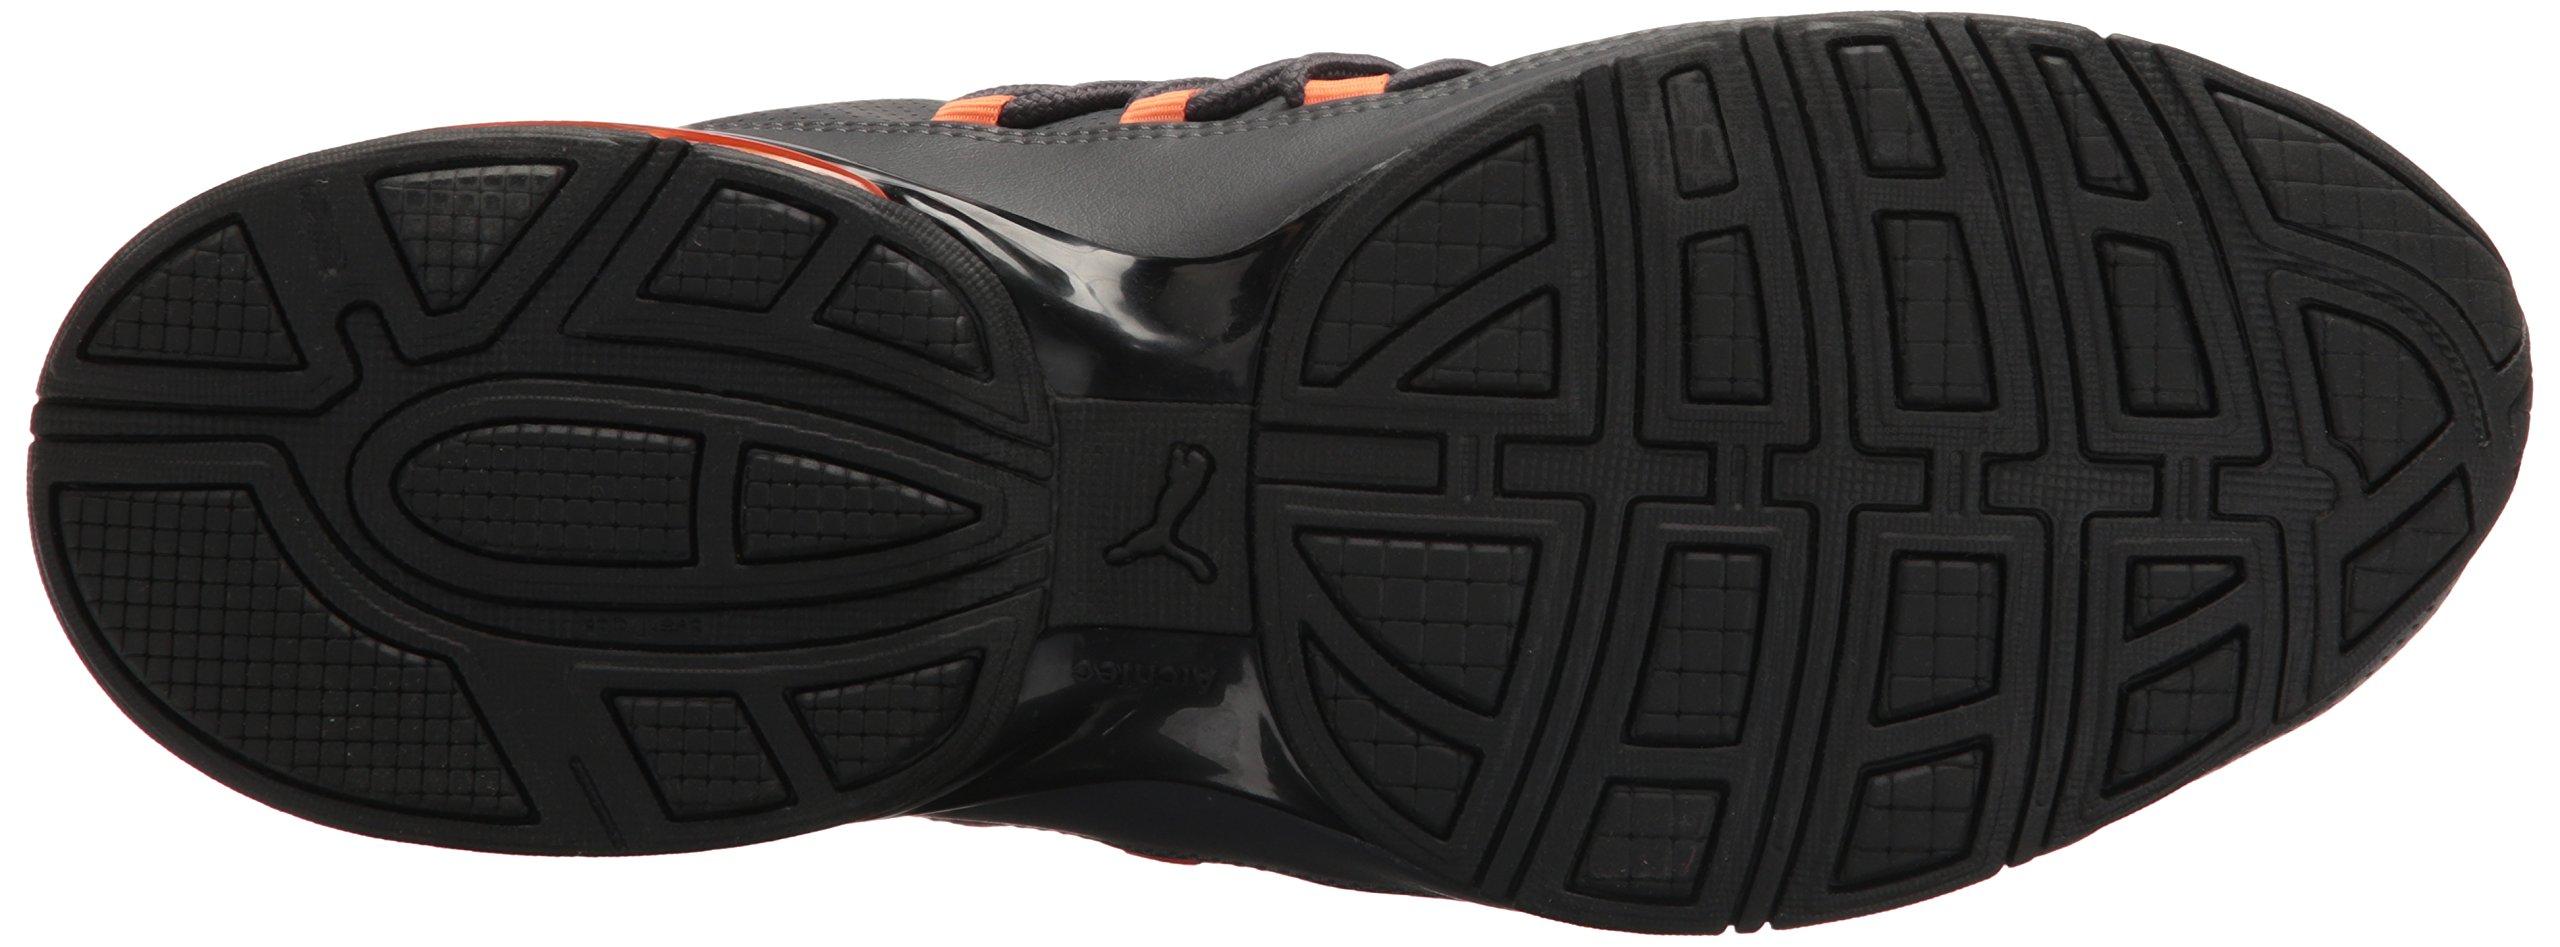 PUMA Men s Cell Regulate SL Sneaker 1bf55fdc3